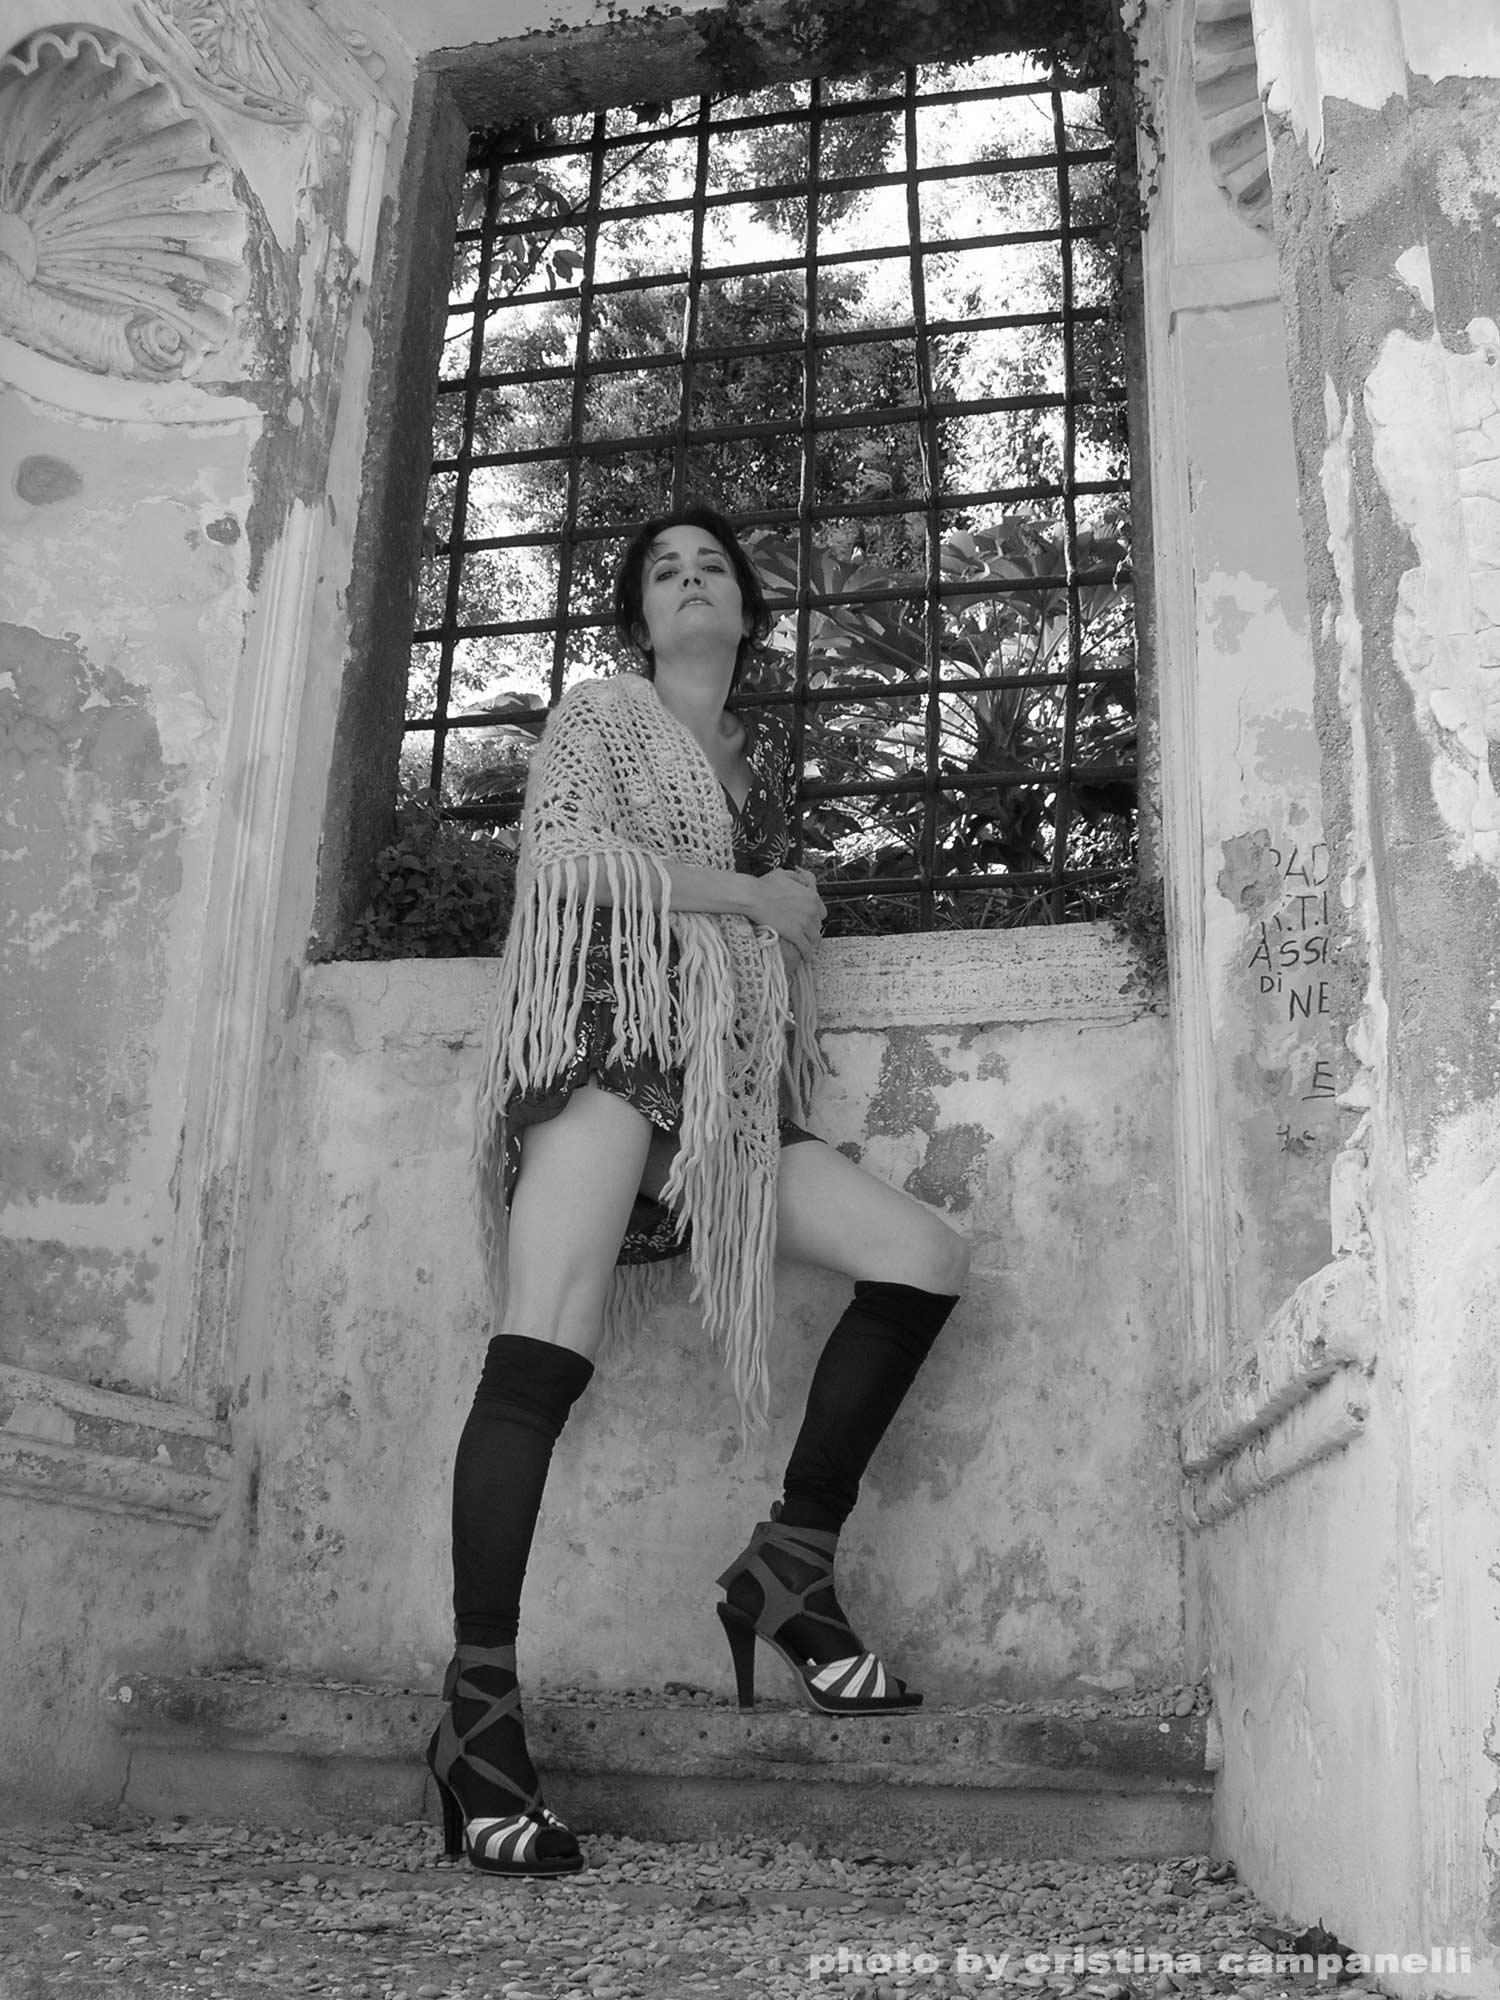 Coralina Cataldi-Tassoni photo by Cristina Campanelli (1).jpg